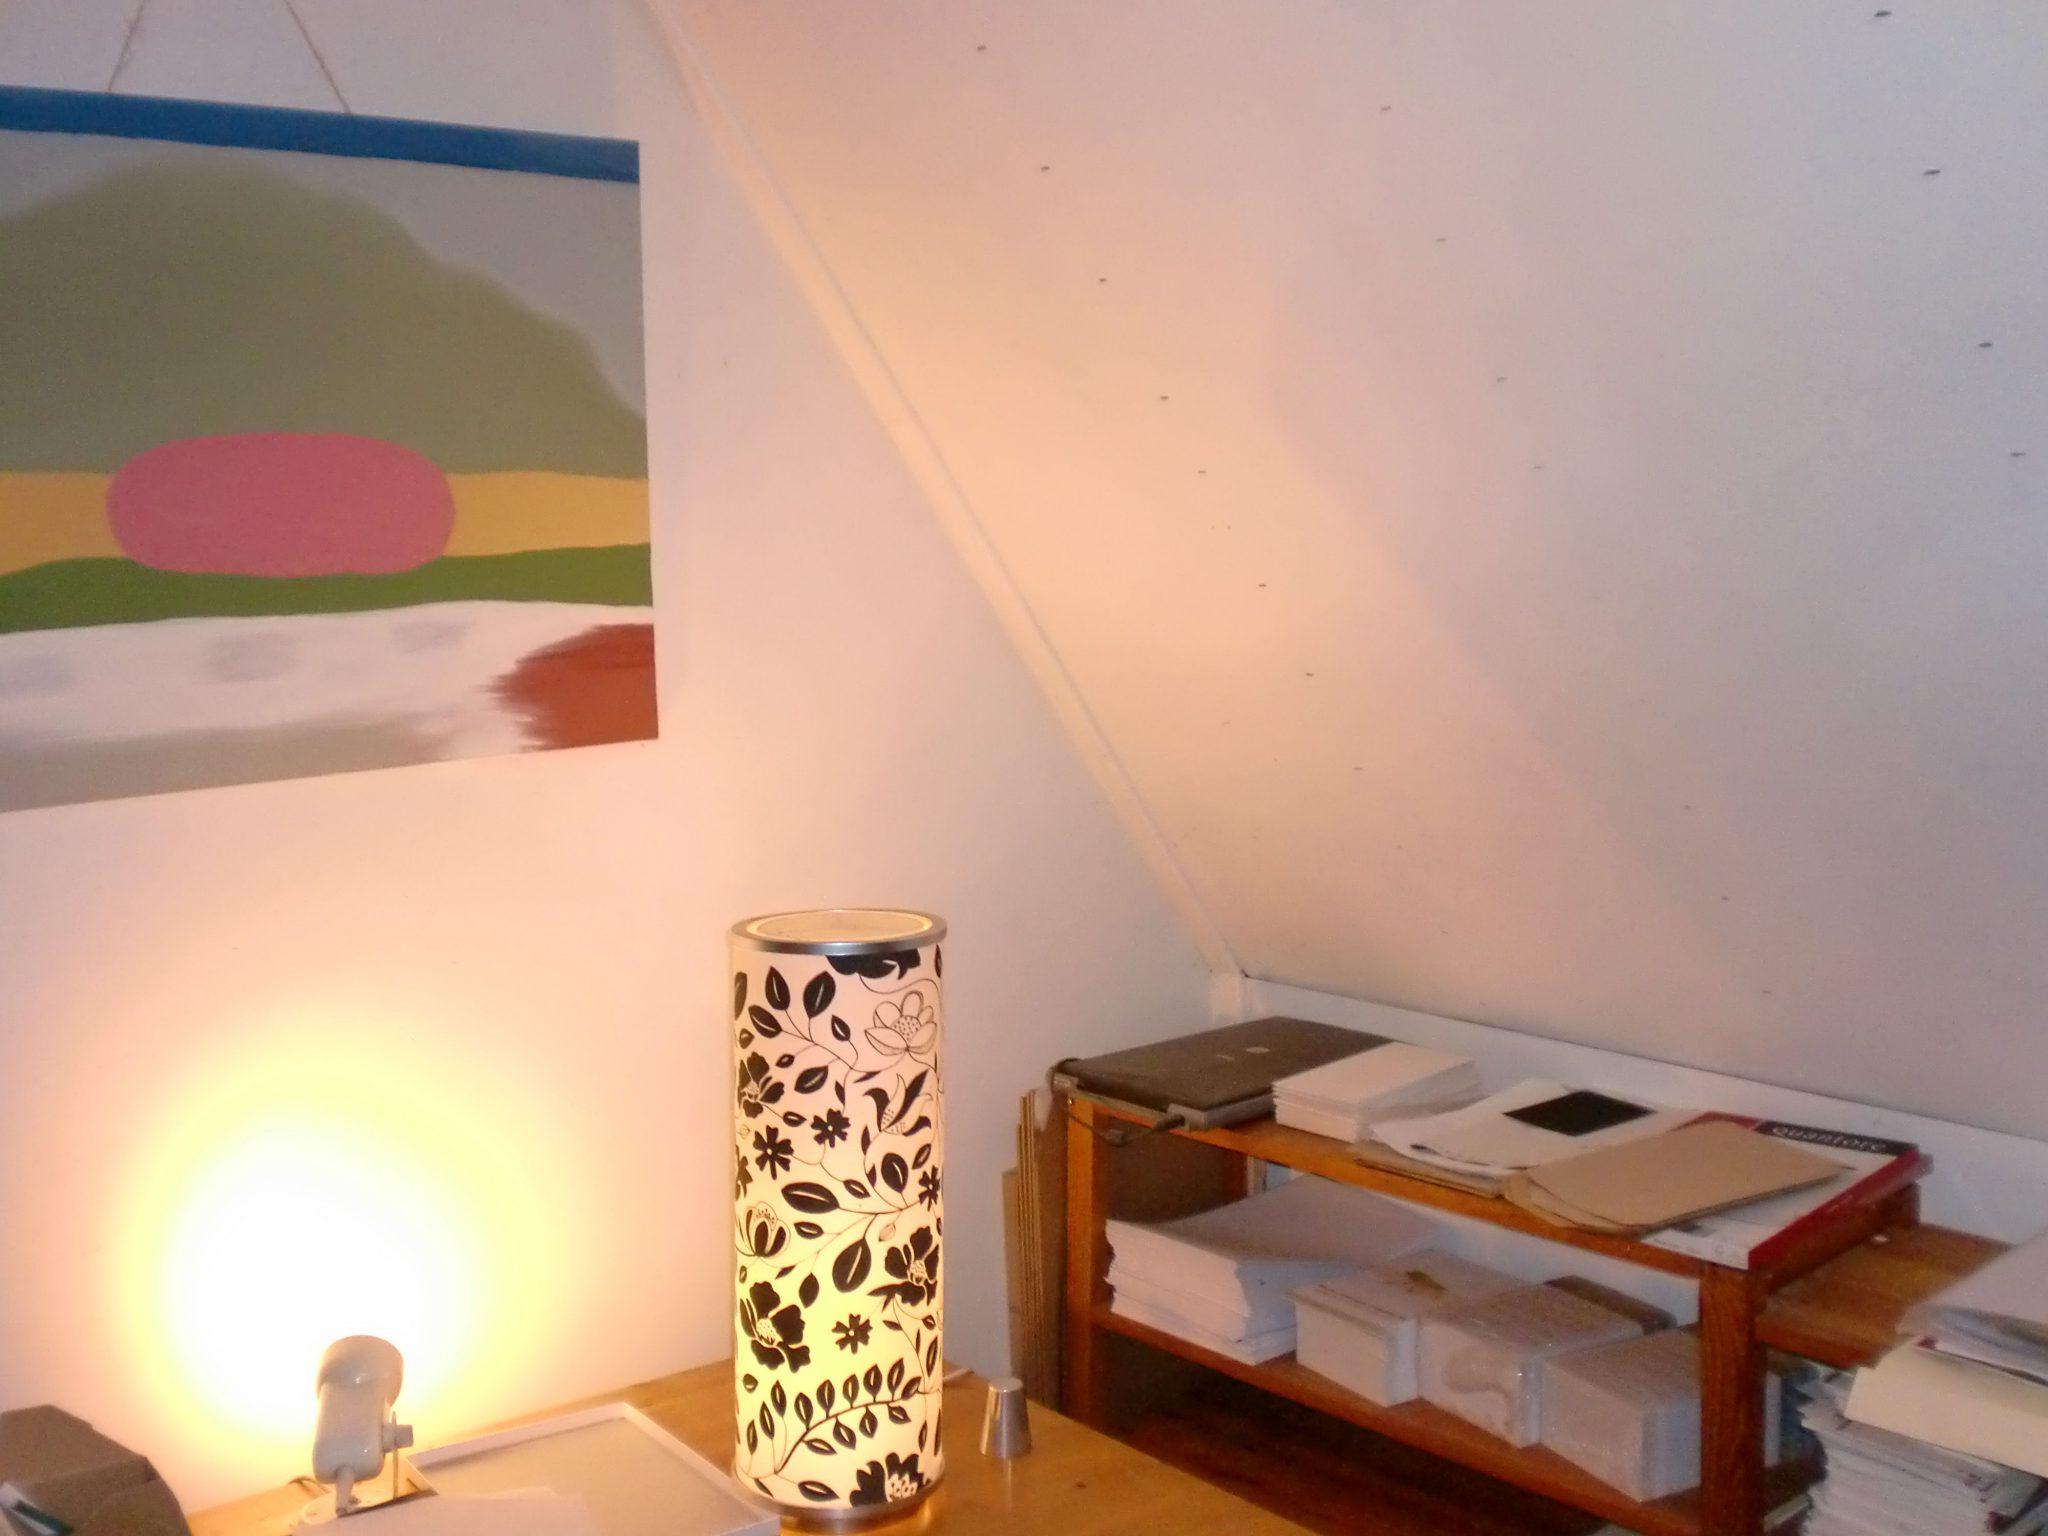 Woonkamer verven of slaapkamer verven?   moose färg belgië ...